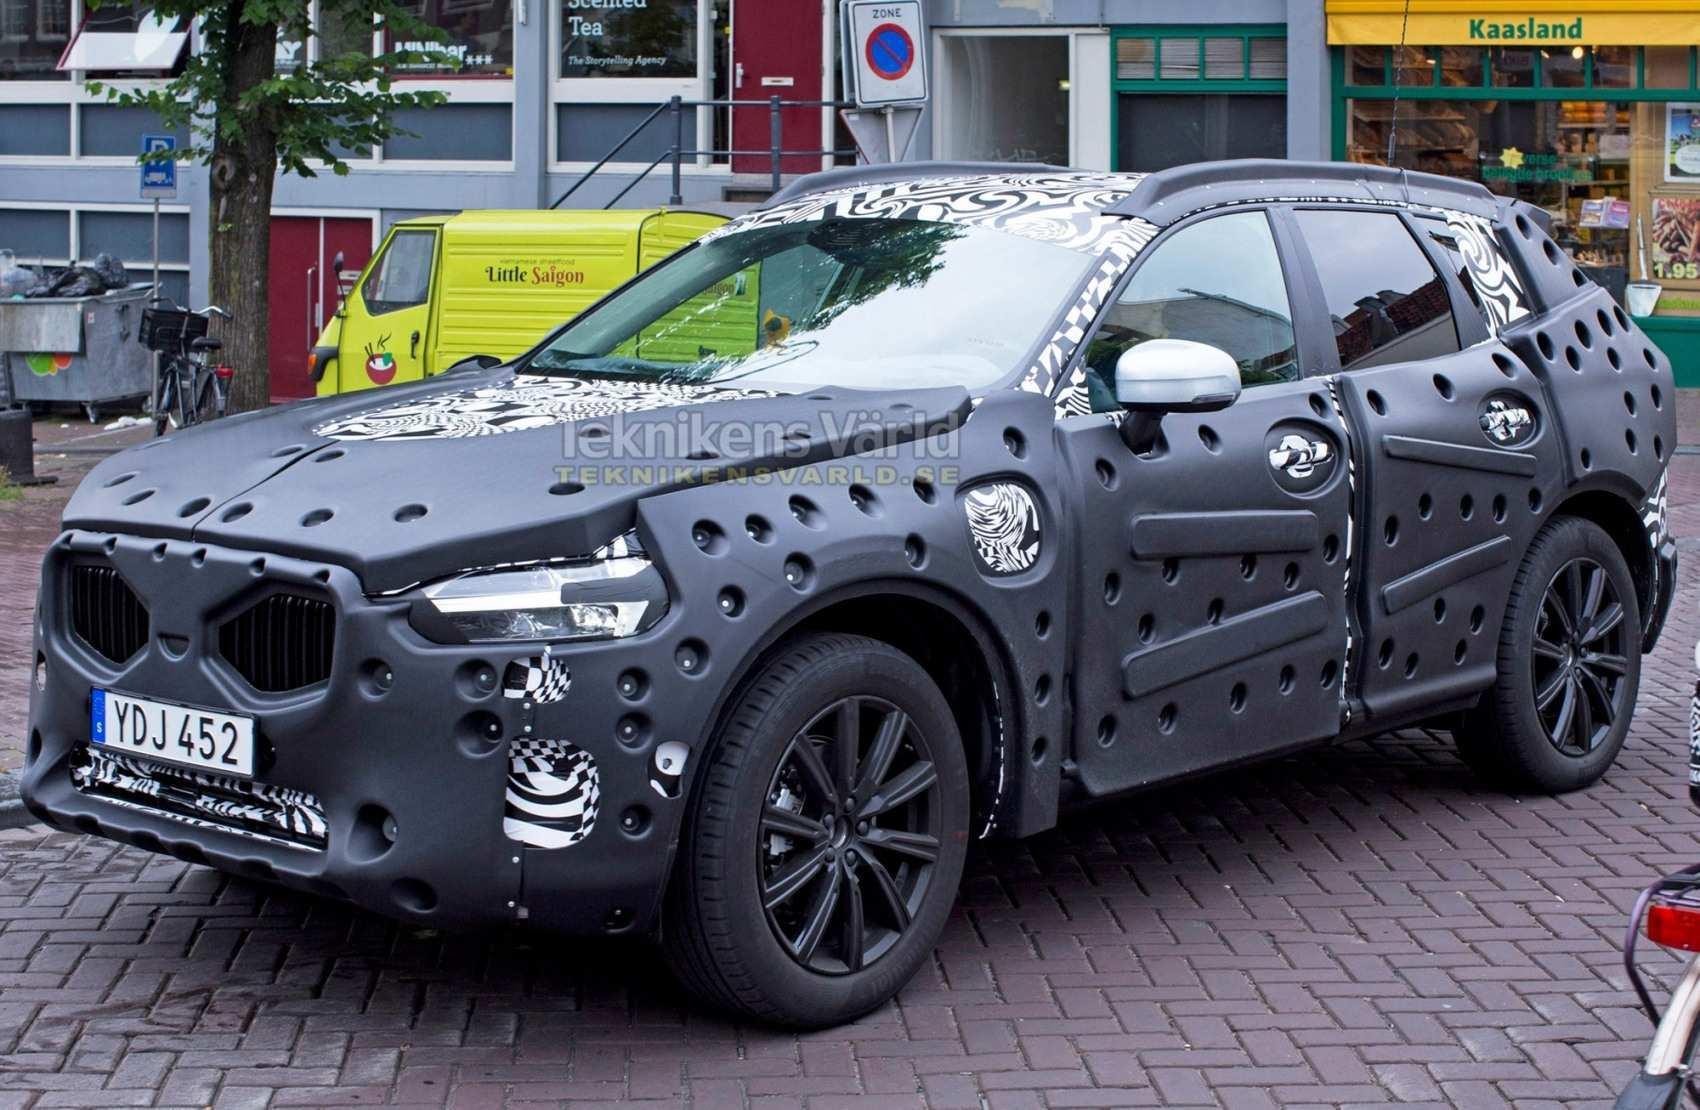 44 All New Volvo 2019 Elbilar Rumors by Volvo 2019 Elbilar